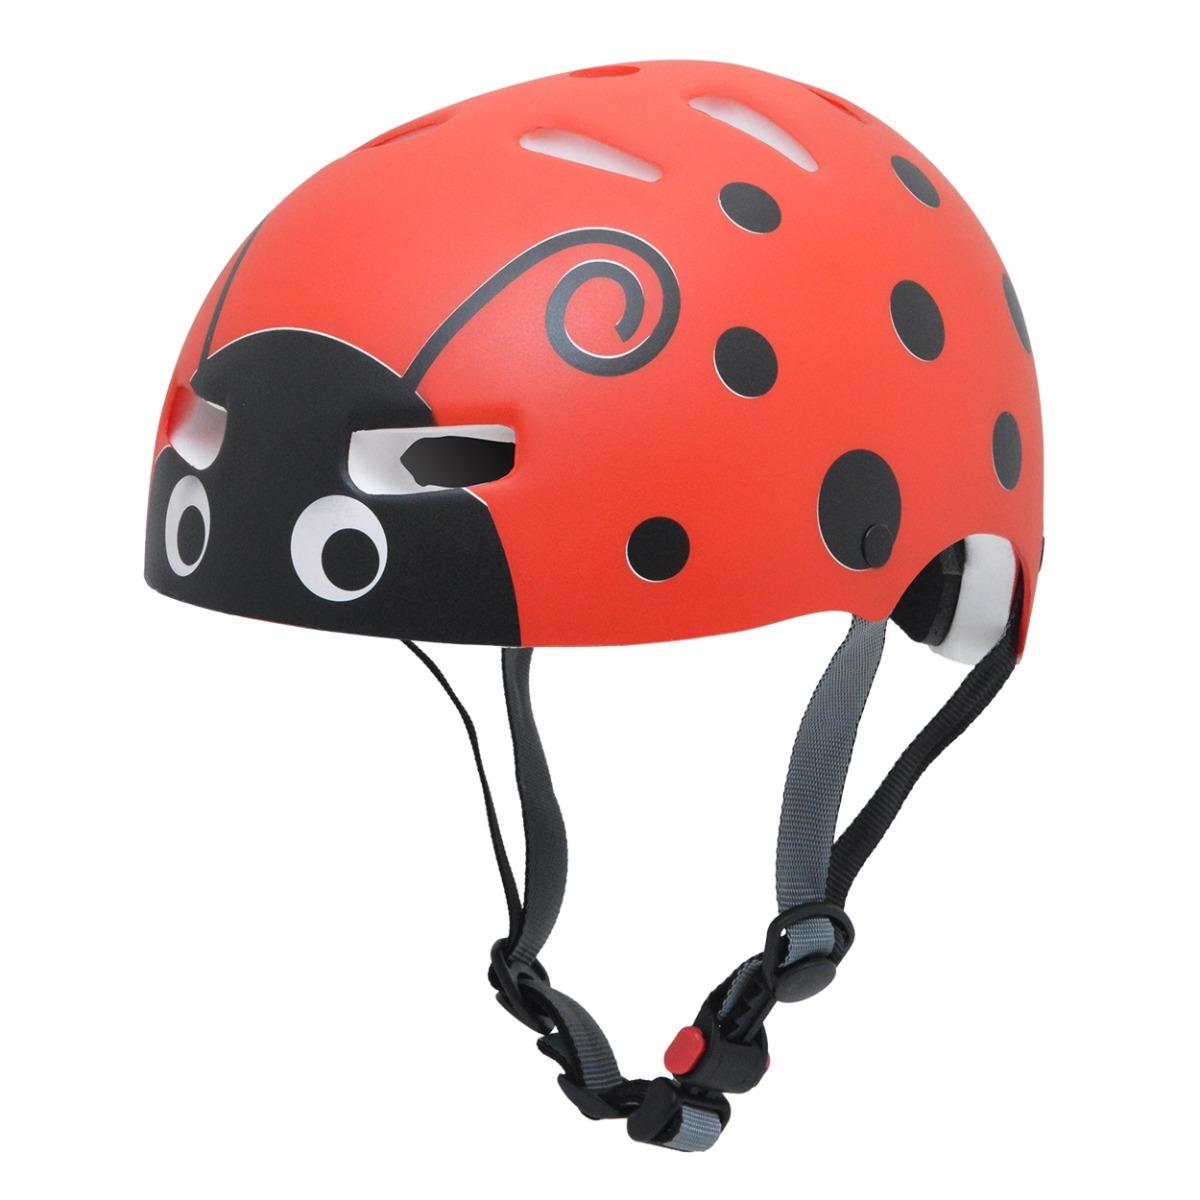 52fe04c9d8e capacete kraft bike skate patins joaninha - frete gratis. Carregando zoom.